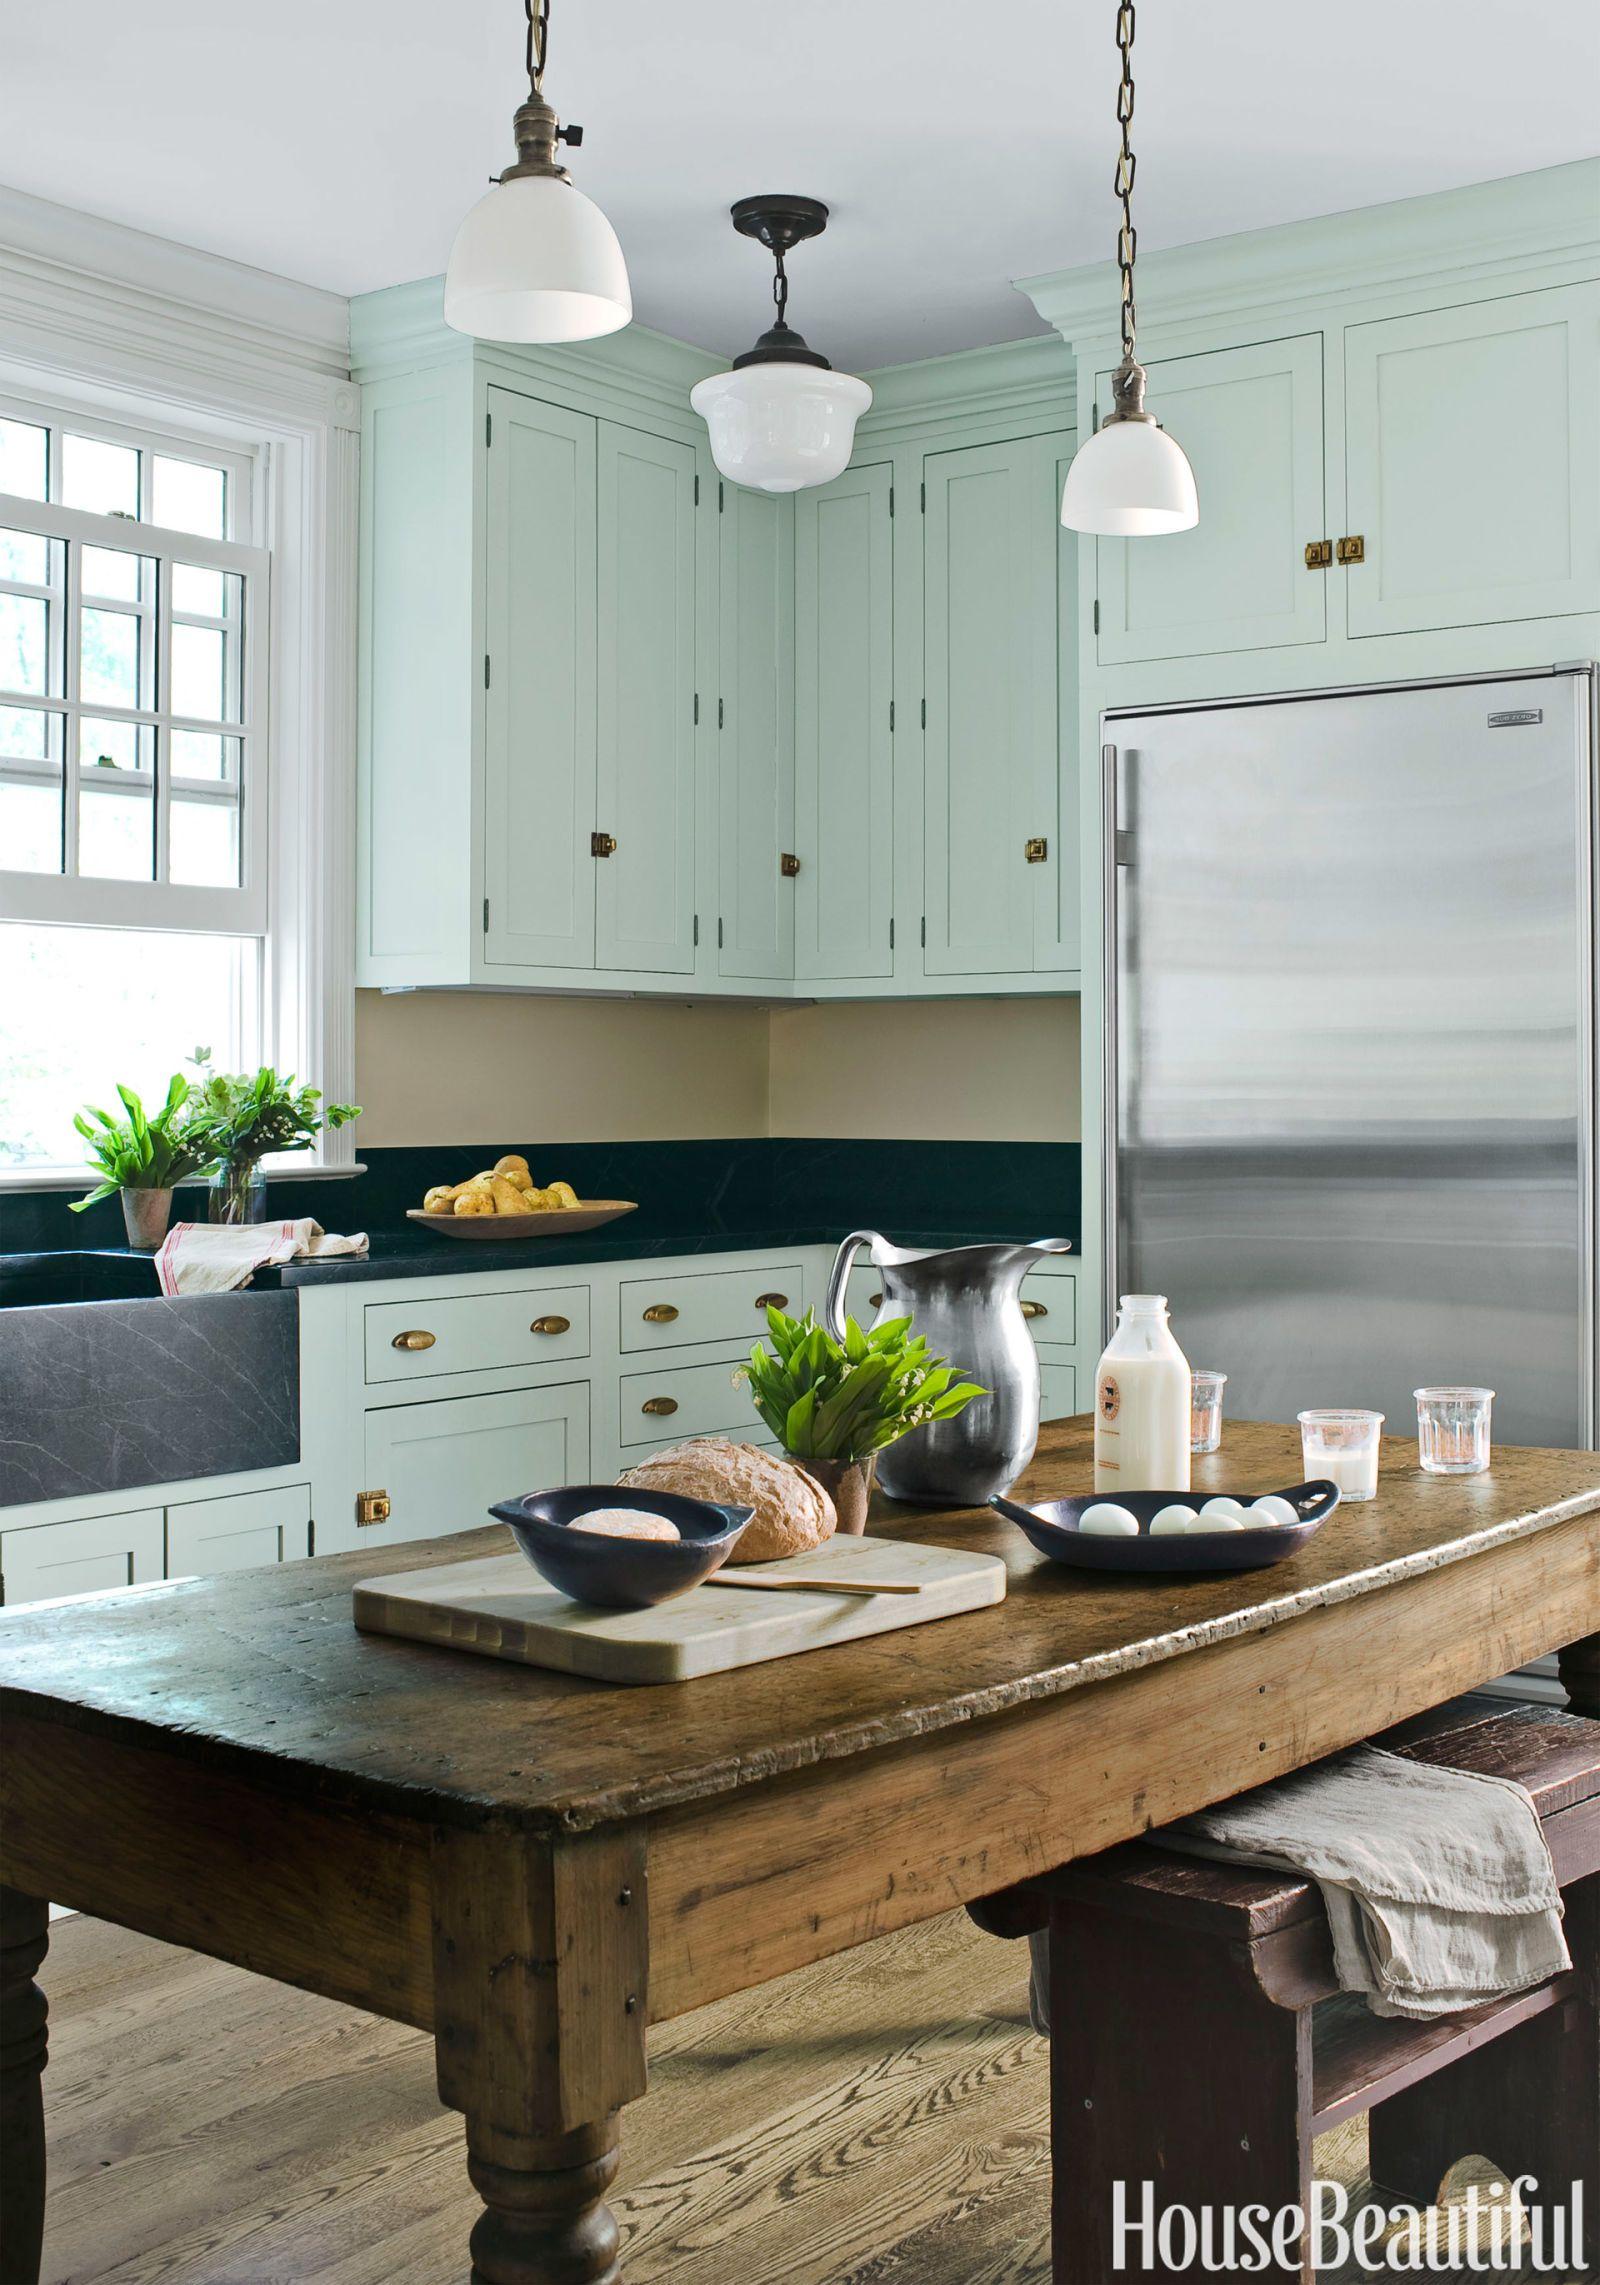 15 Great Design Ideas For Your Kitchen  Mount Kisco Soapstone Awesome New York Kitchen Design Style Design Inspiration